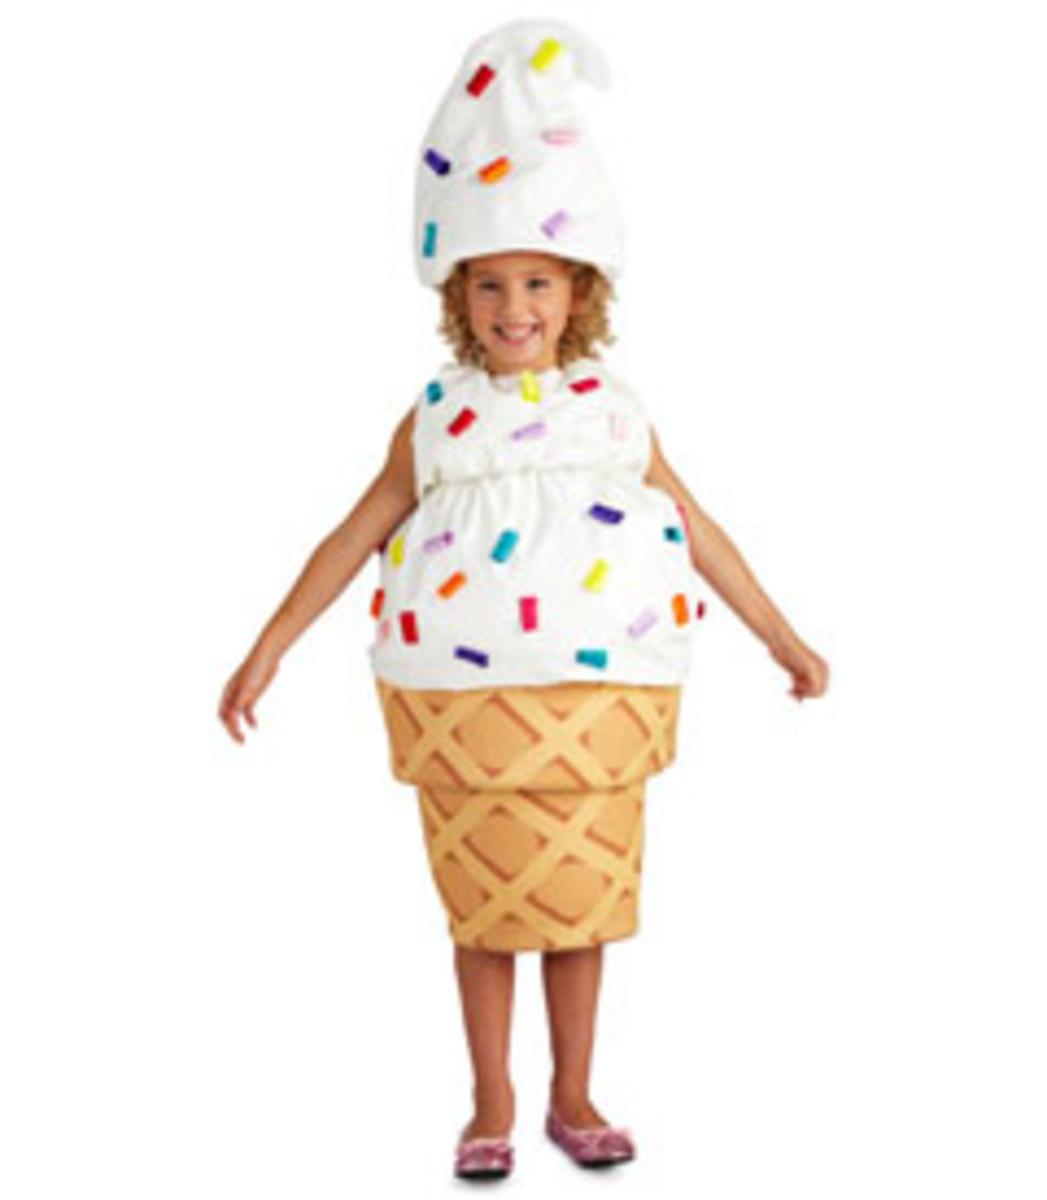 ice cream cone costume on a little girl - cute!